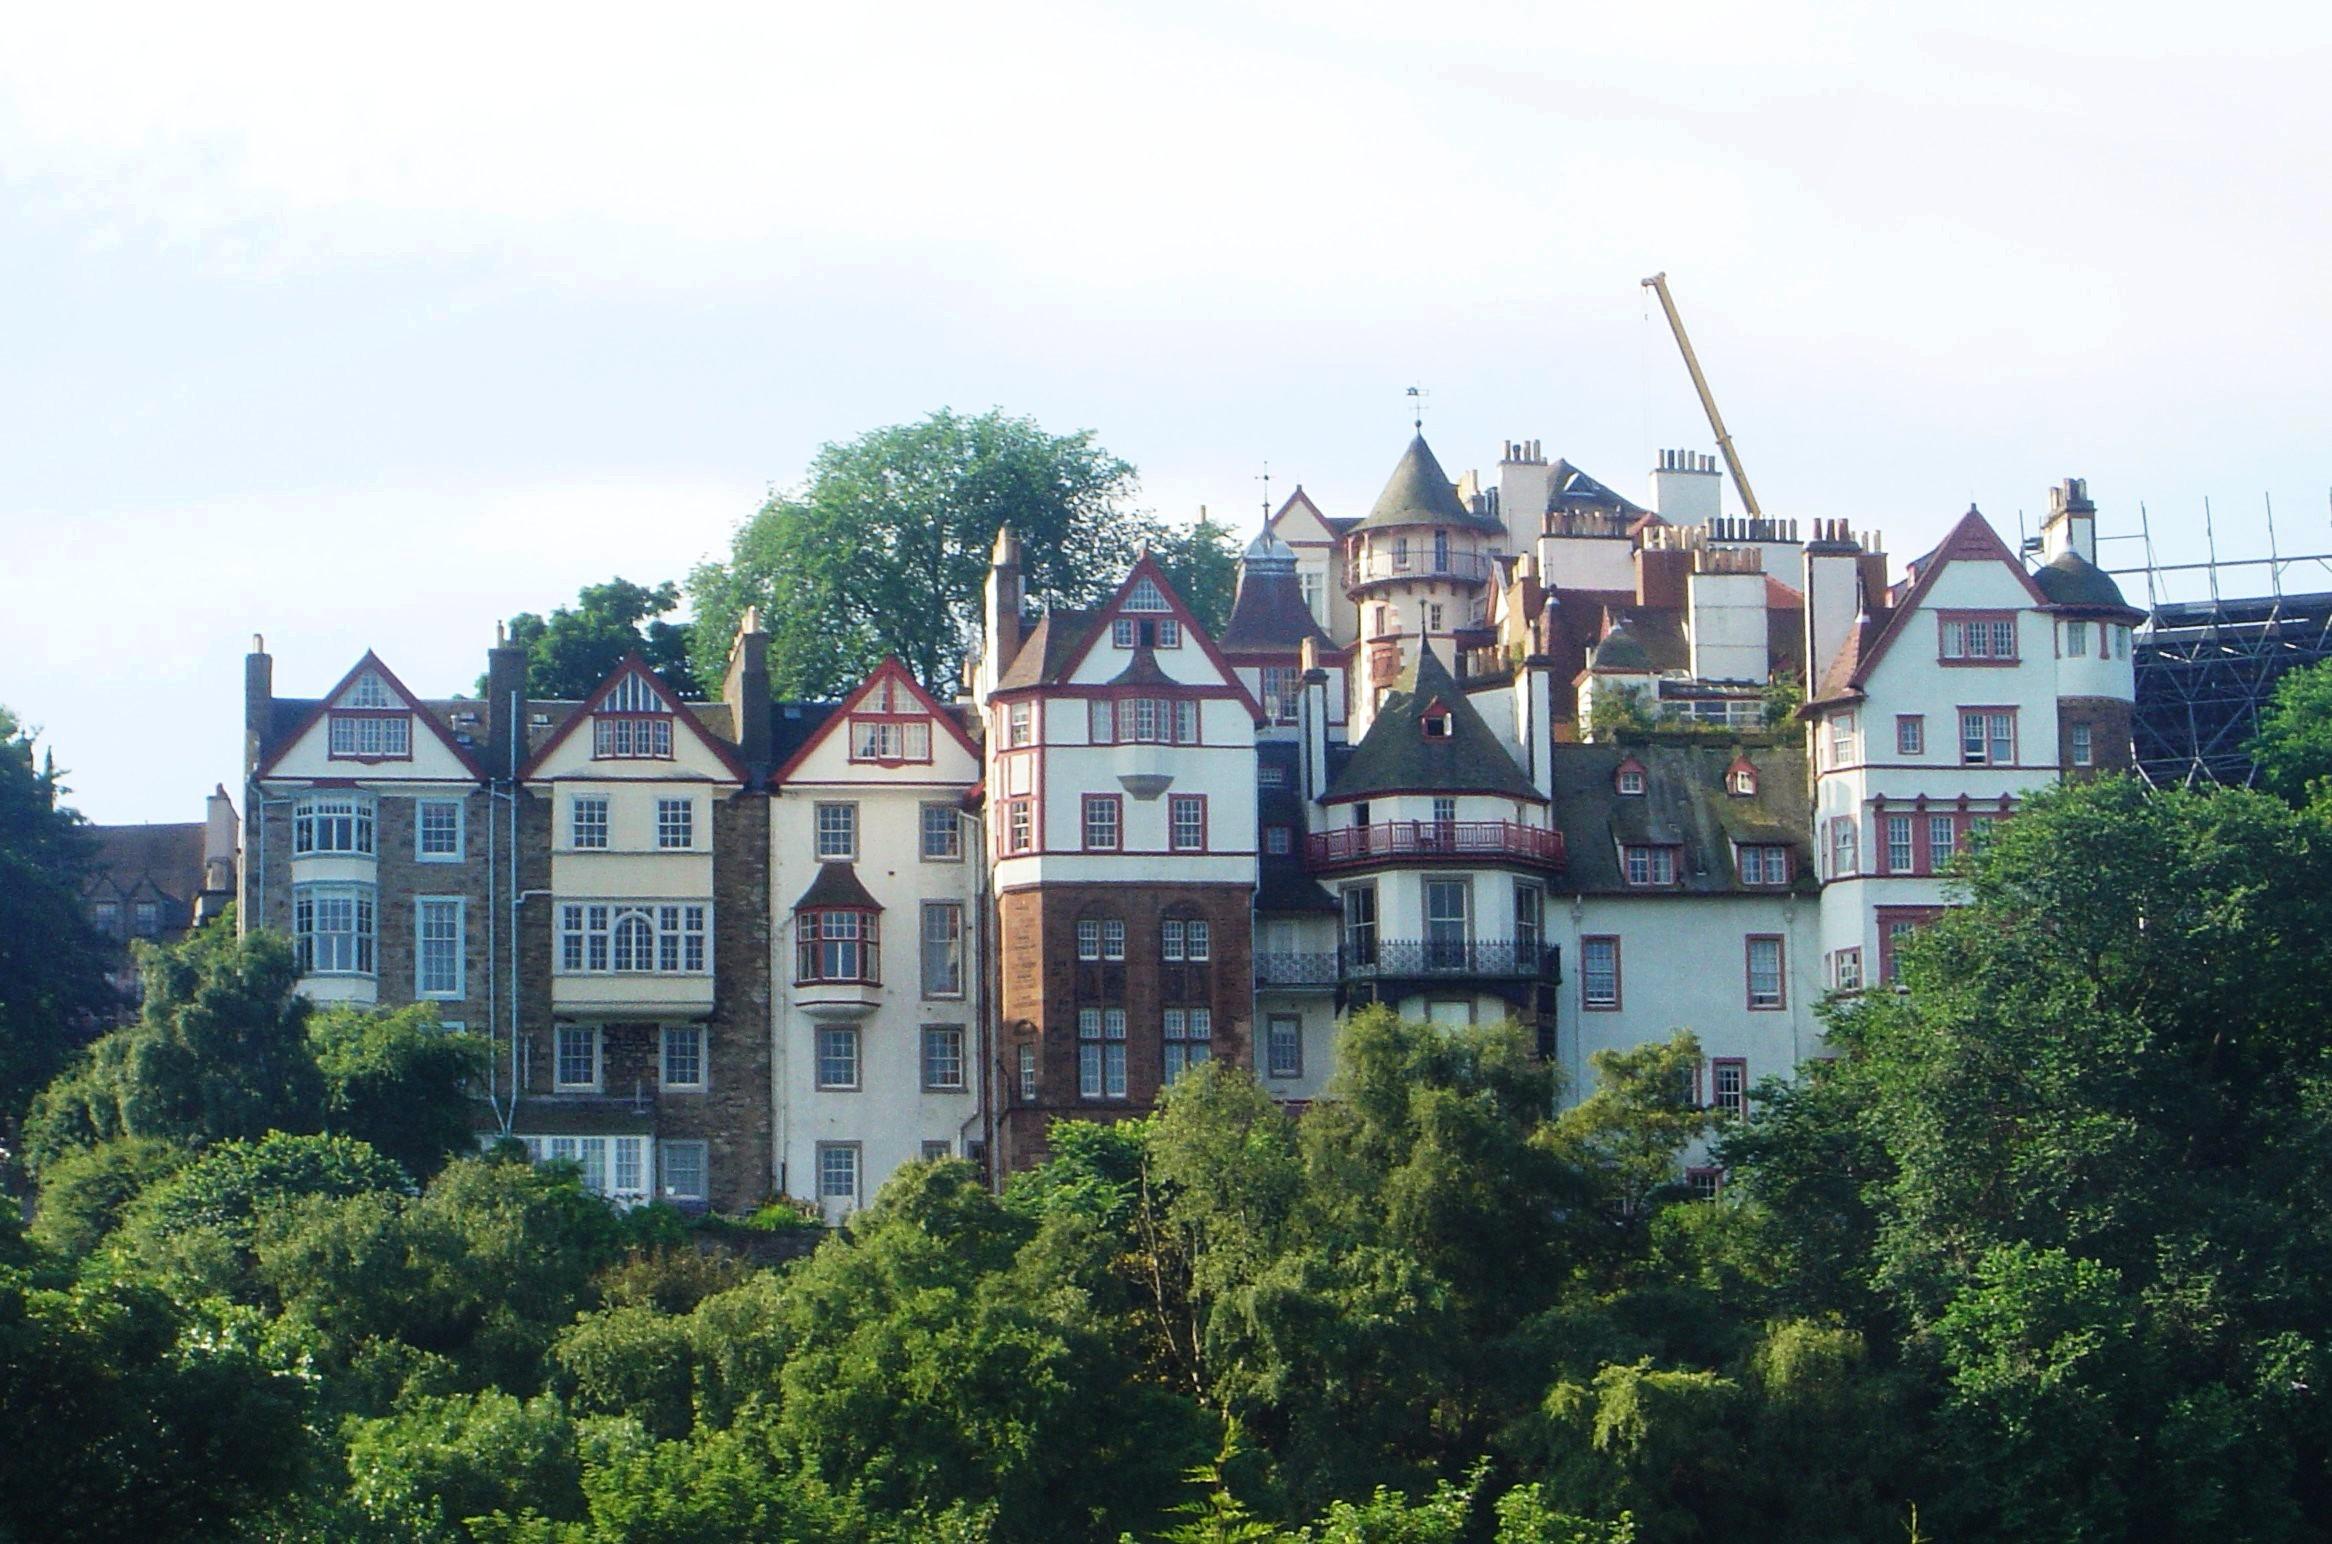 EDINBURGH'S OLD TOWN (PHOTO:  David Monniaux